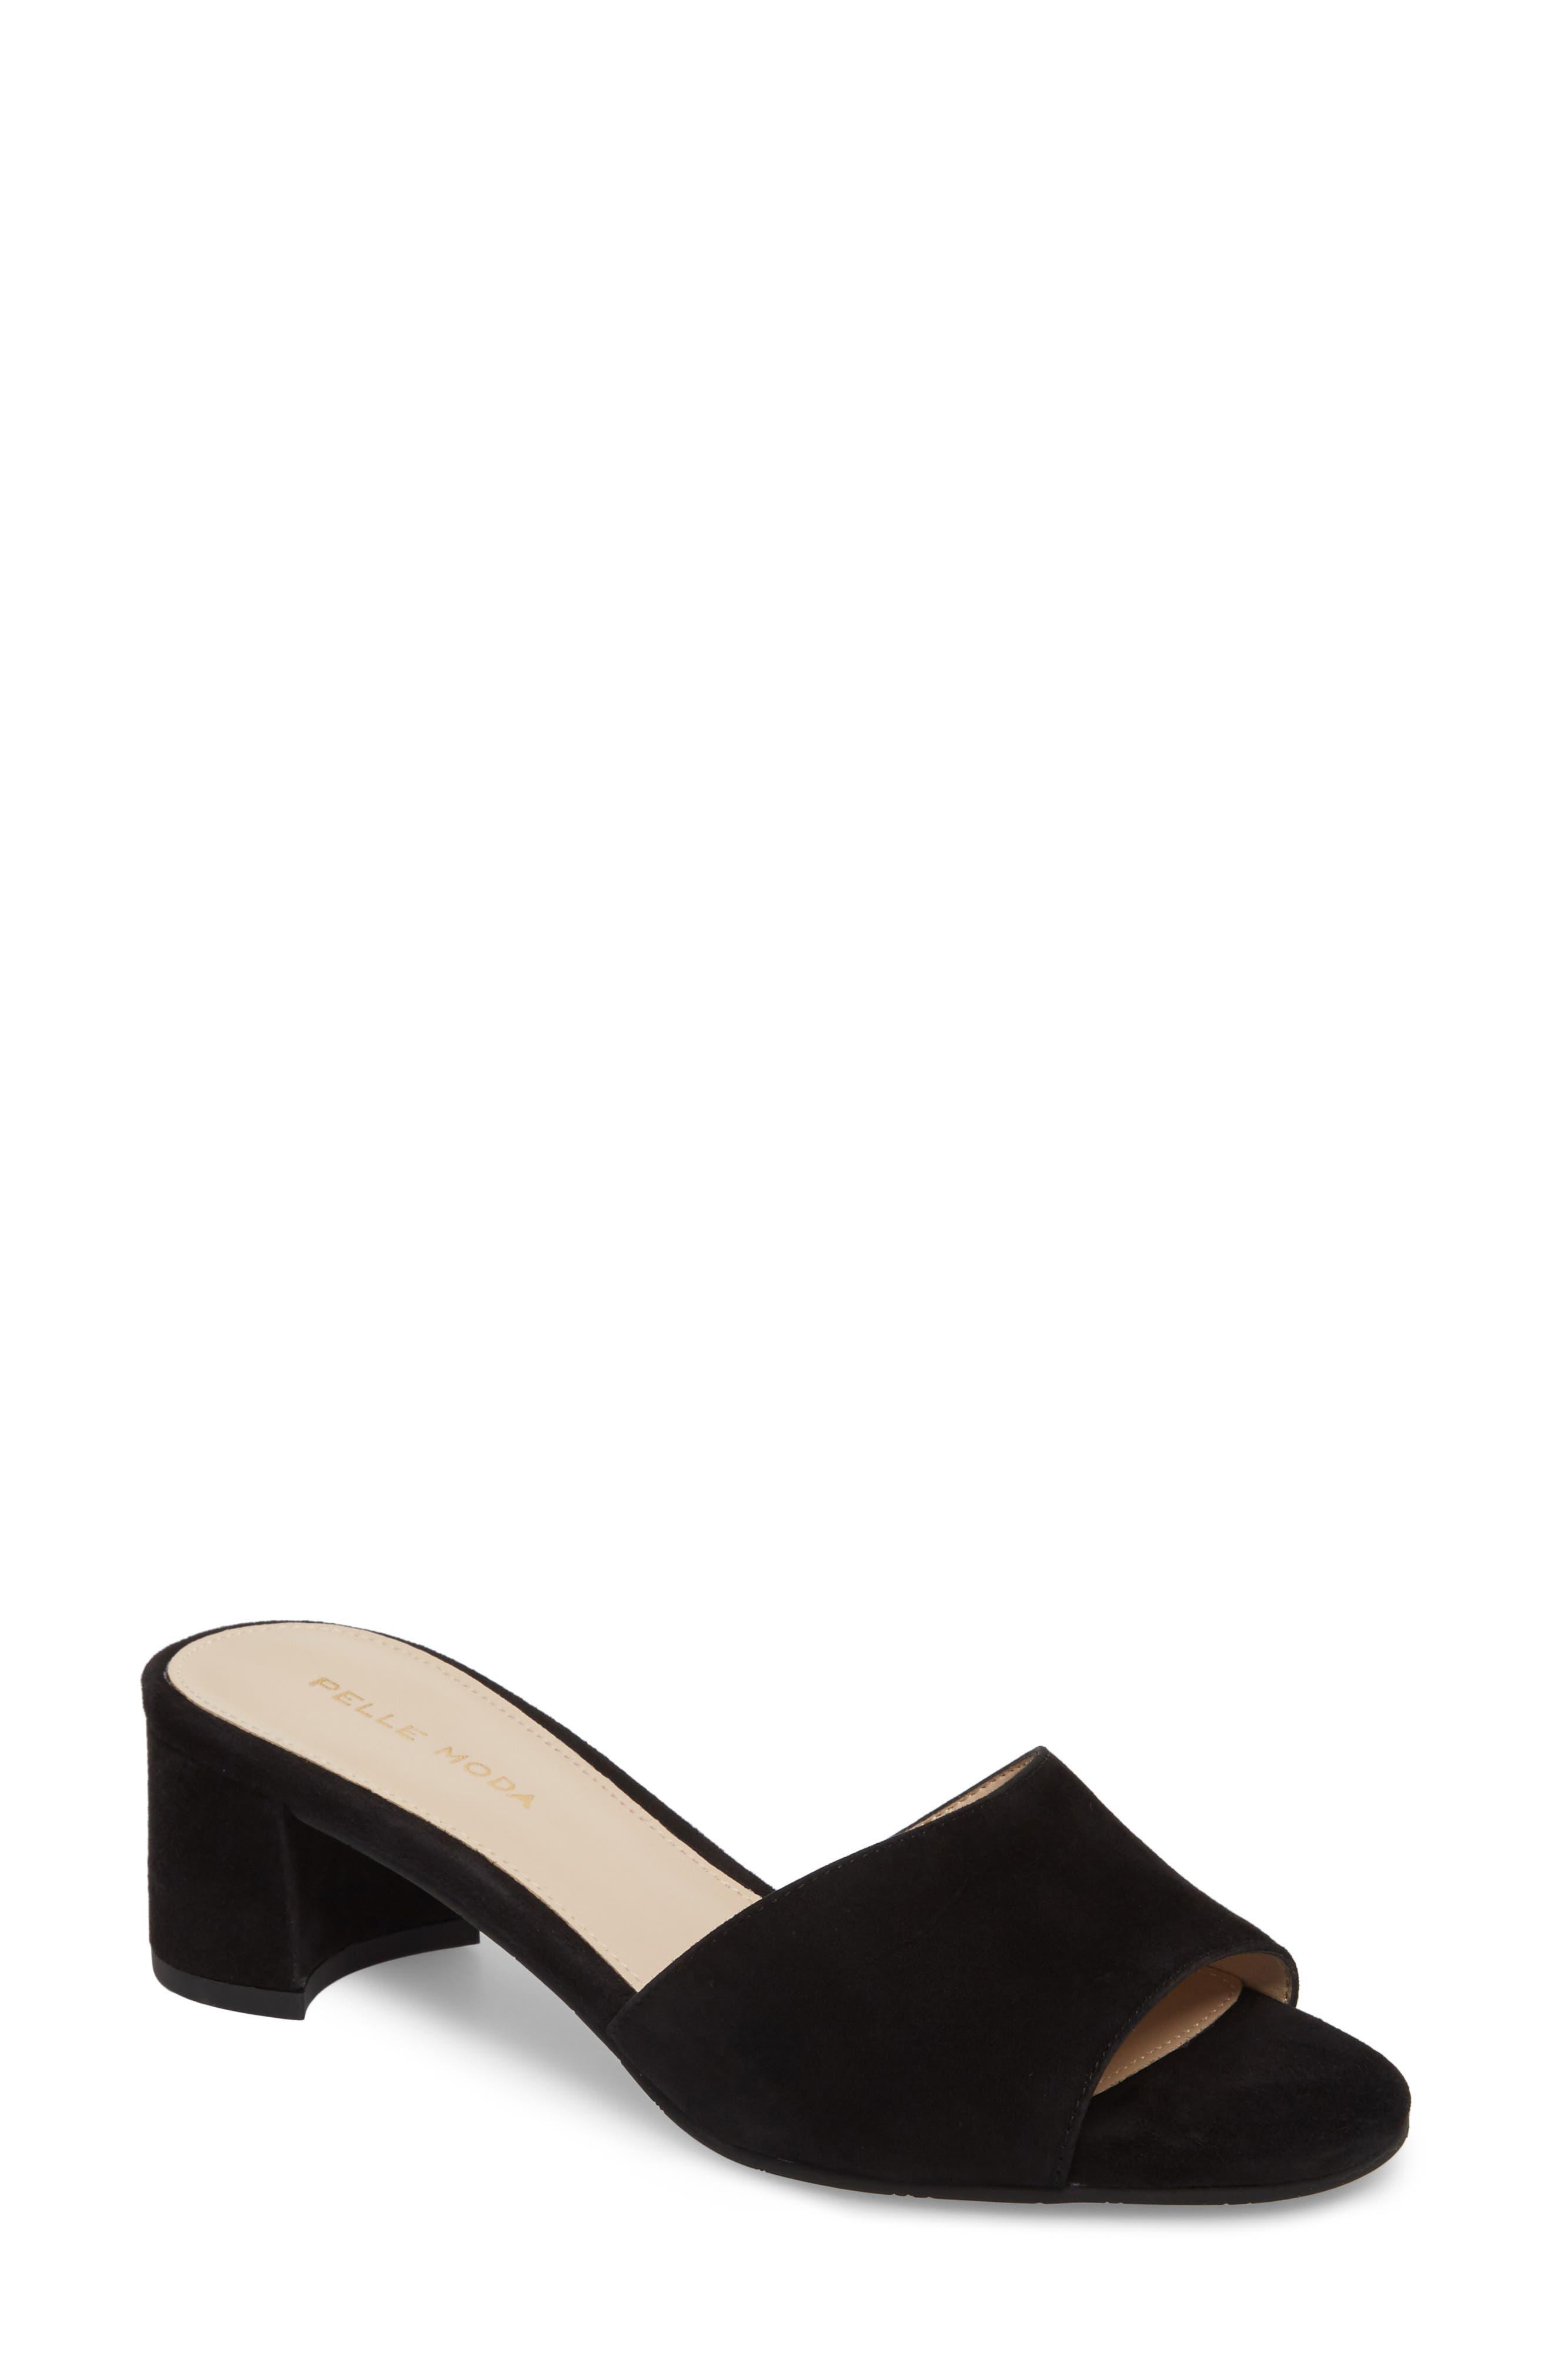 Rea Block Heel Slide Sandal,                         Main,                         color, 001